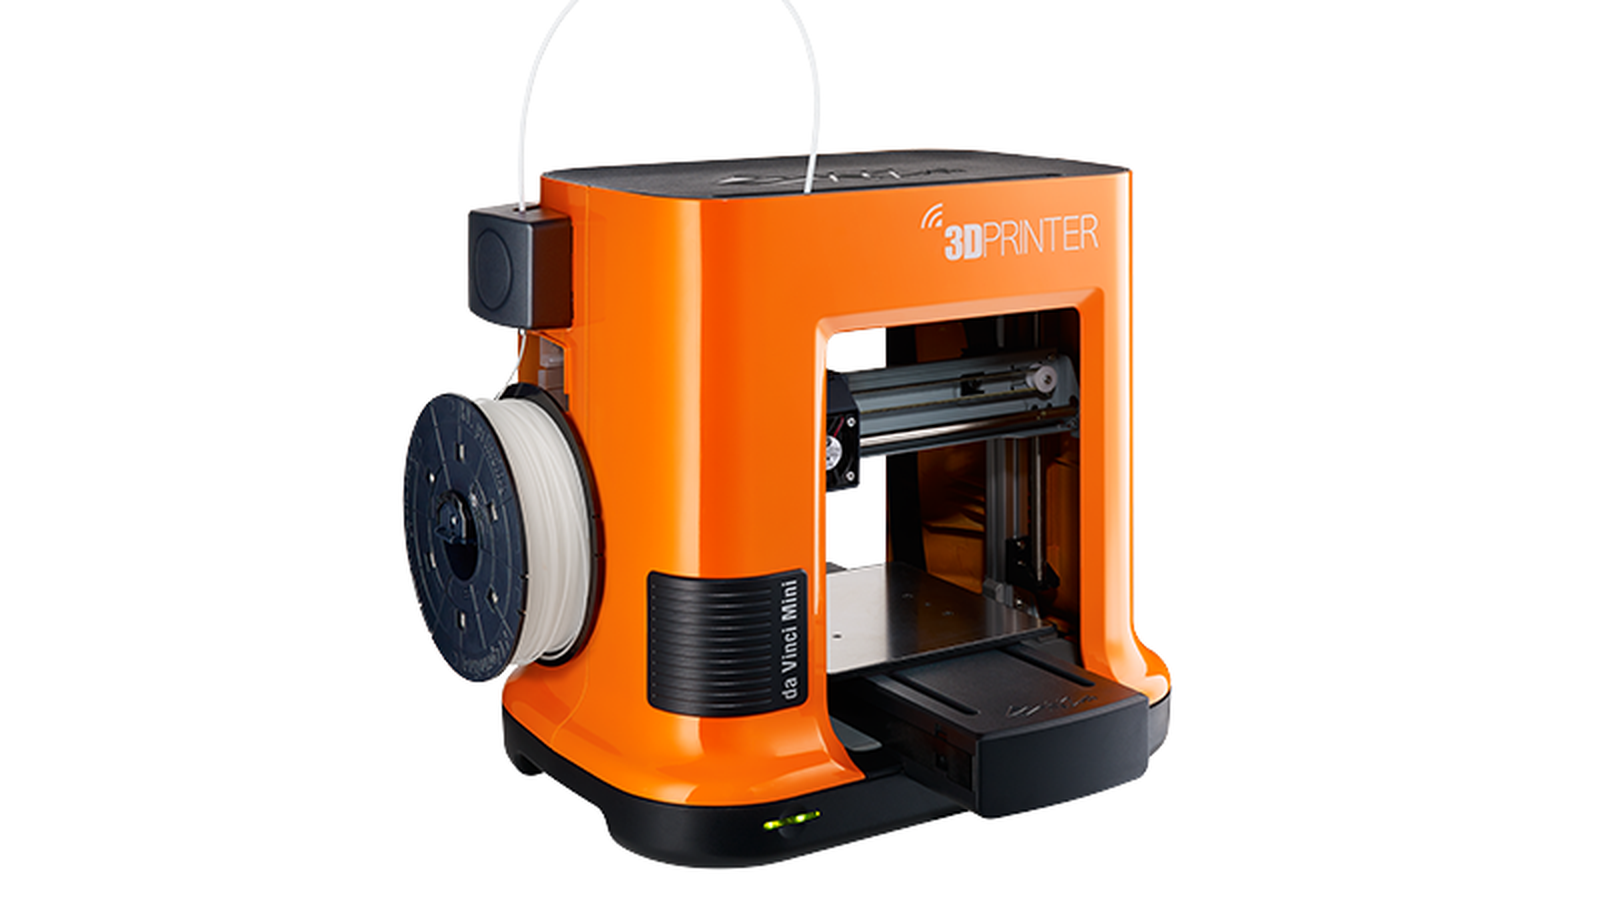 da Vinci Mini Cheap 3d printer, 3d printer, Technology